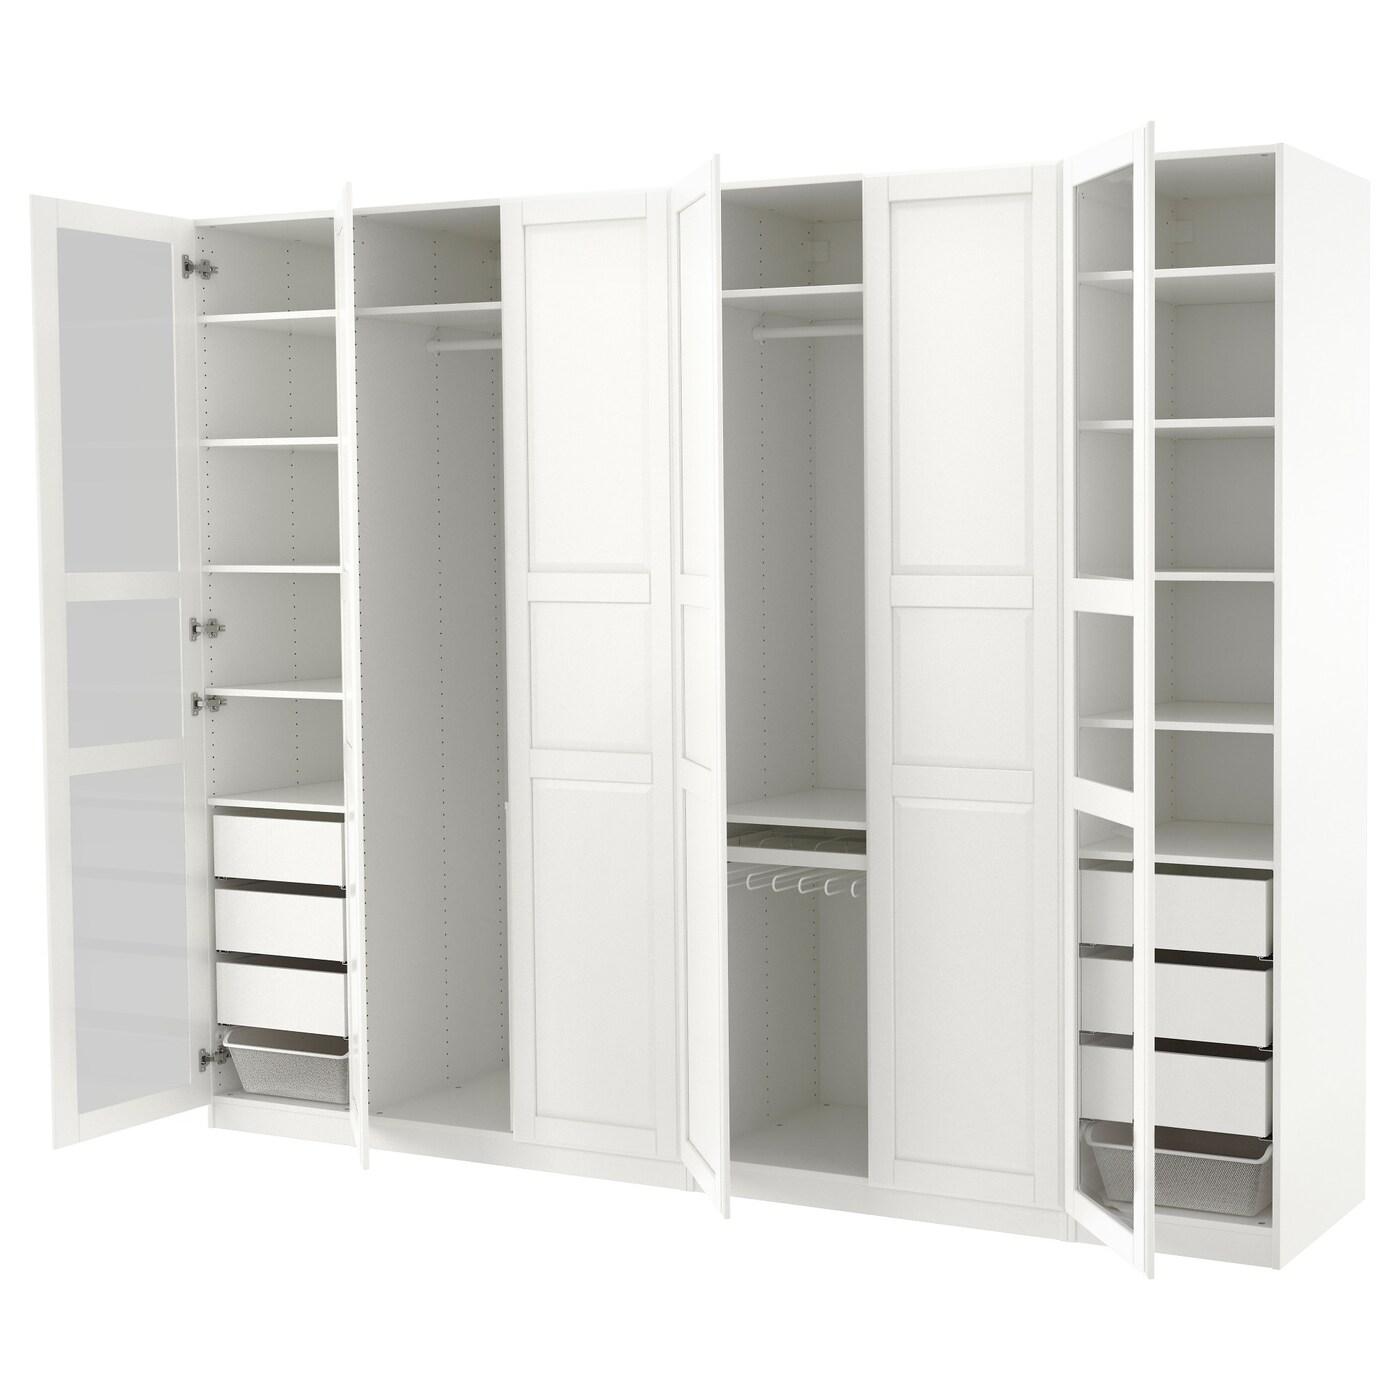 pax wardrobe white tyssedal tyssedal glass 300 x 60 x 236 cm ikea. Black Bedroom Furniture Sets. Home Design Ideas